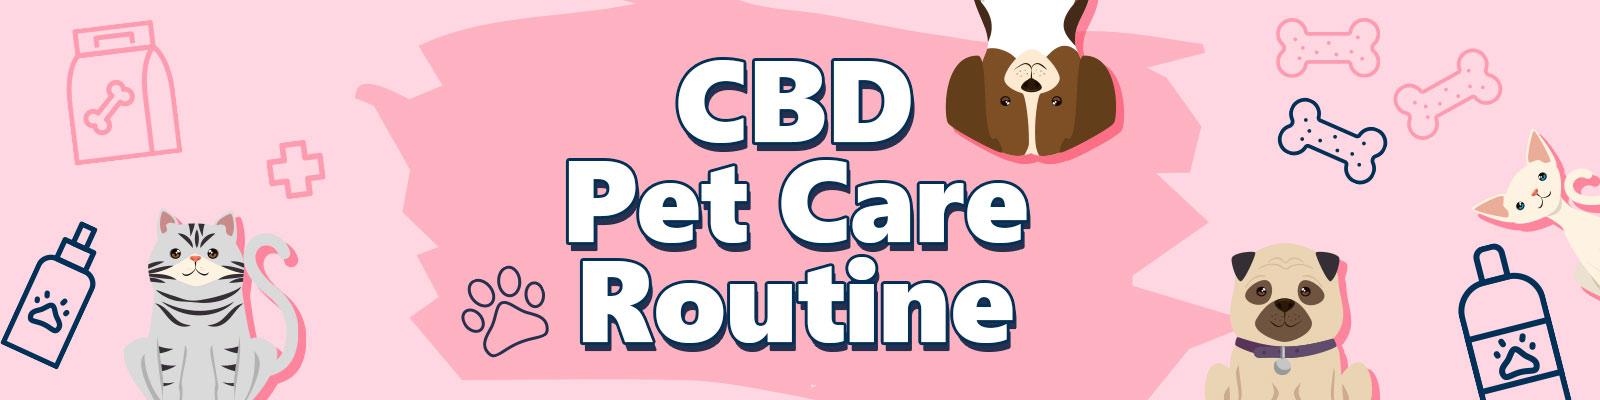 CBD Pet Care Routine